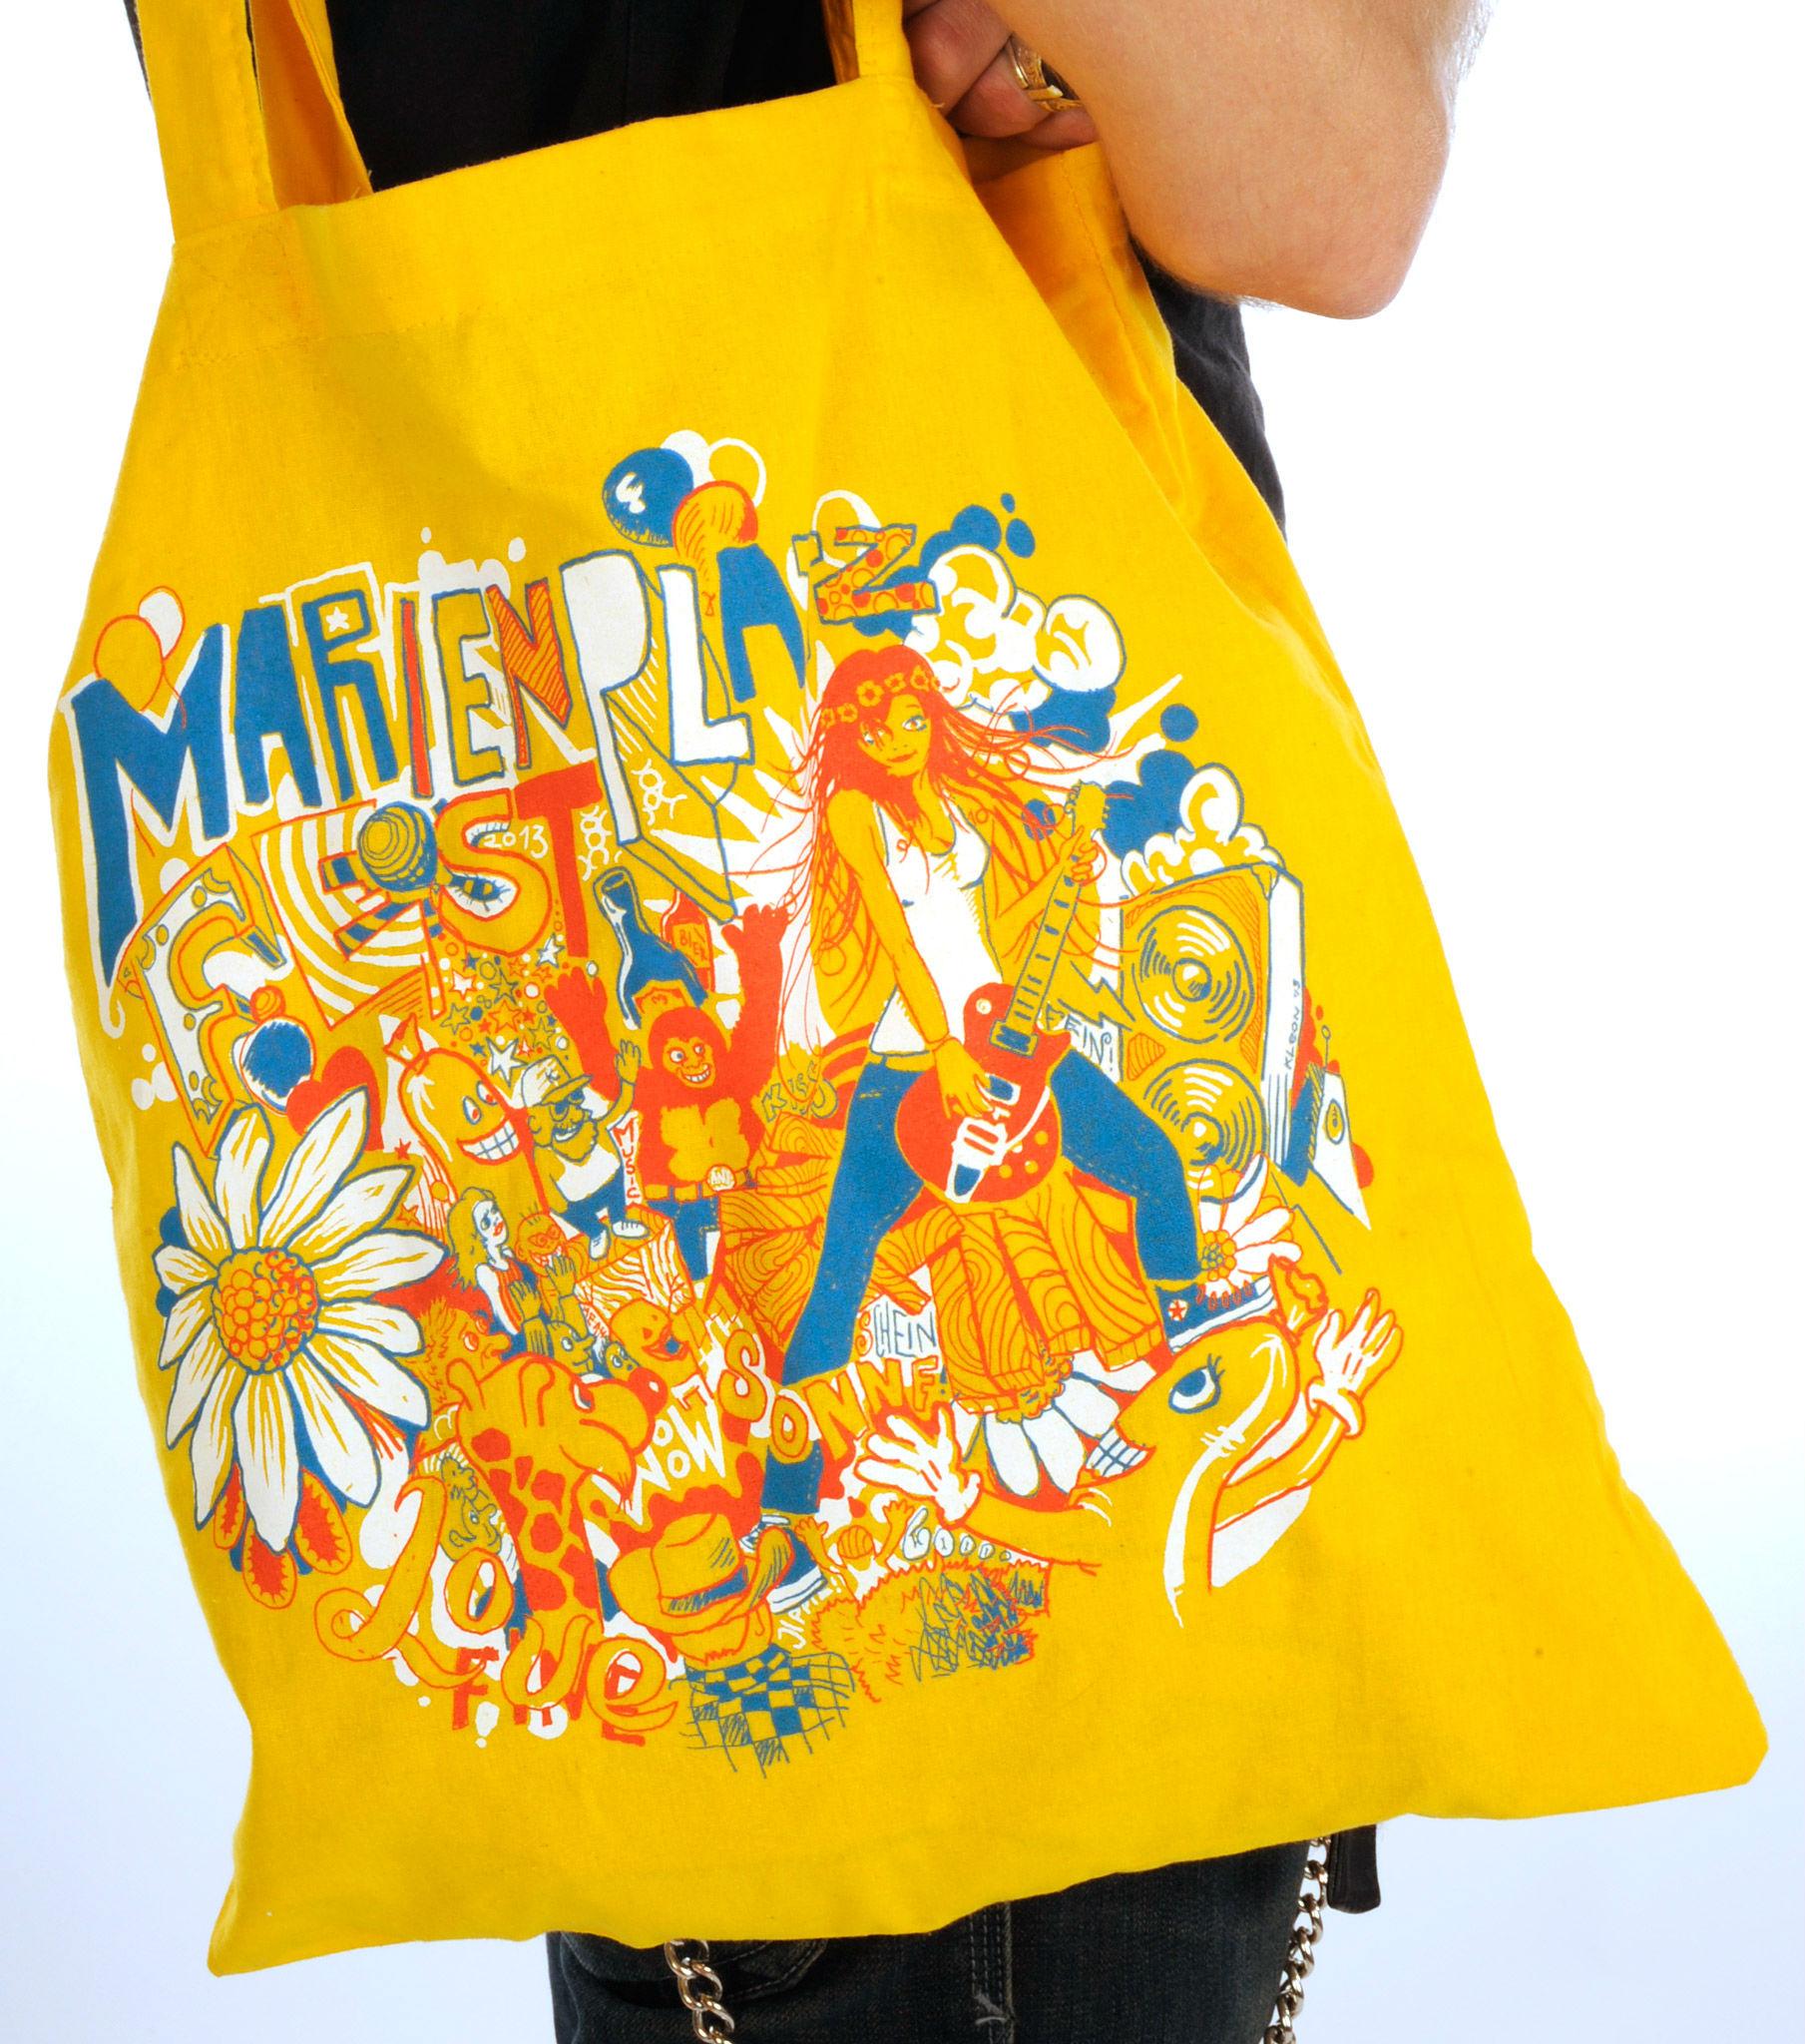 Kleon Medugorac Marienplatzfest 2013